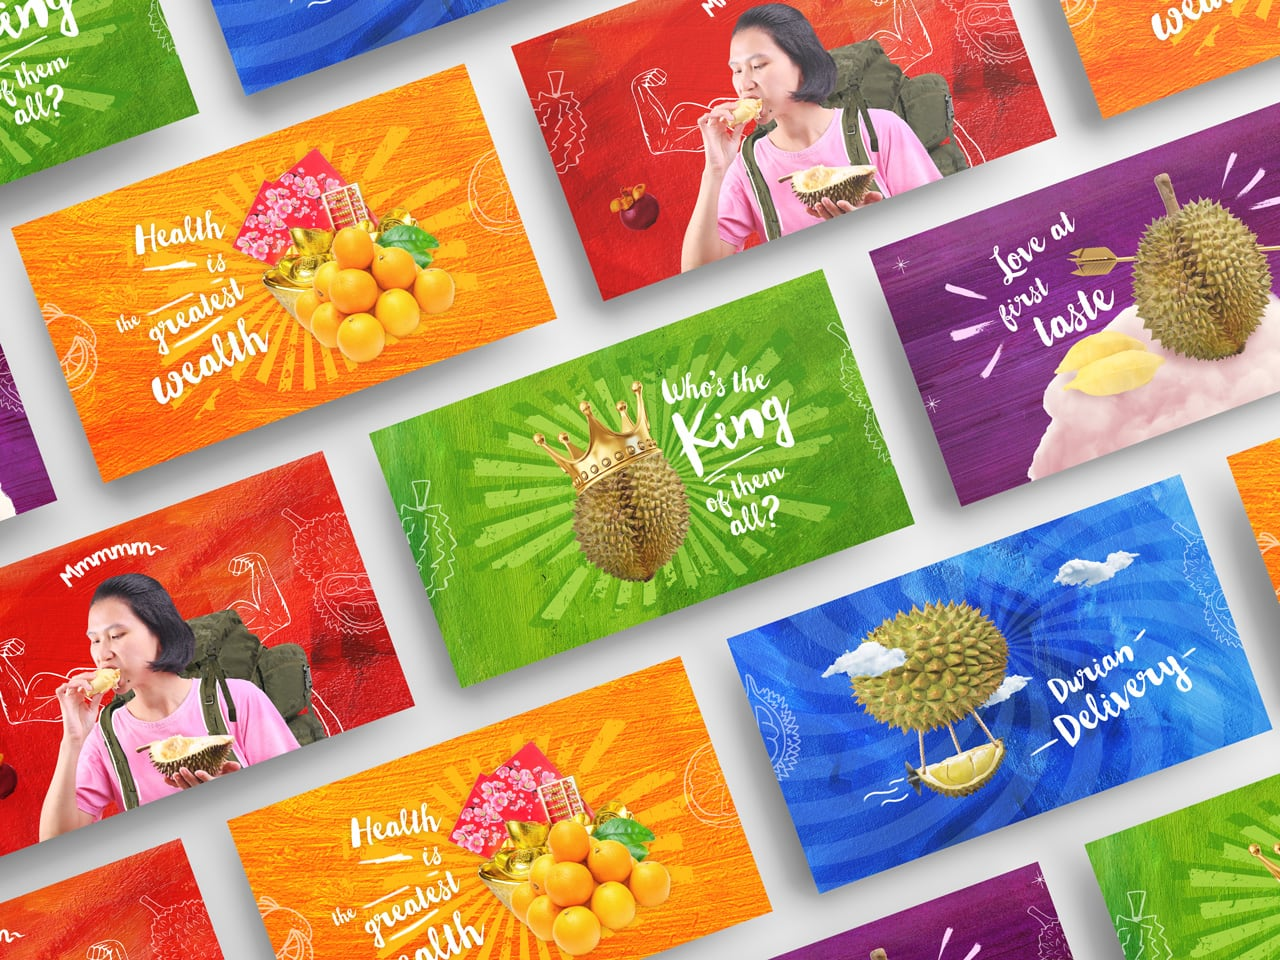 Durian Culture Visual